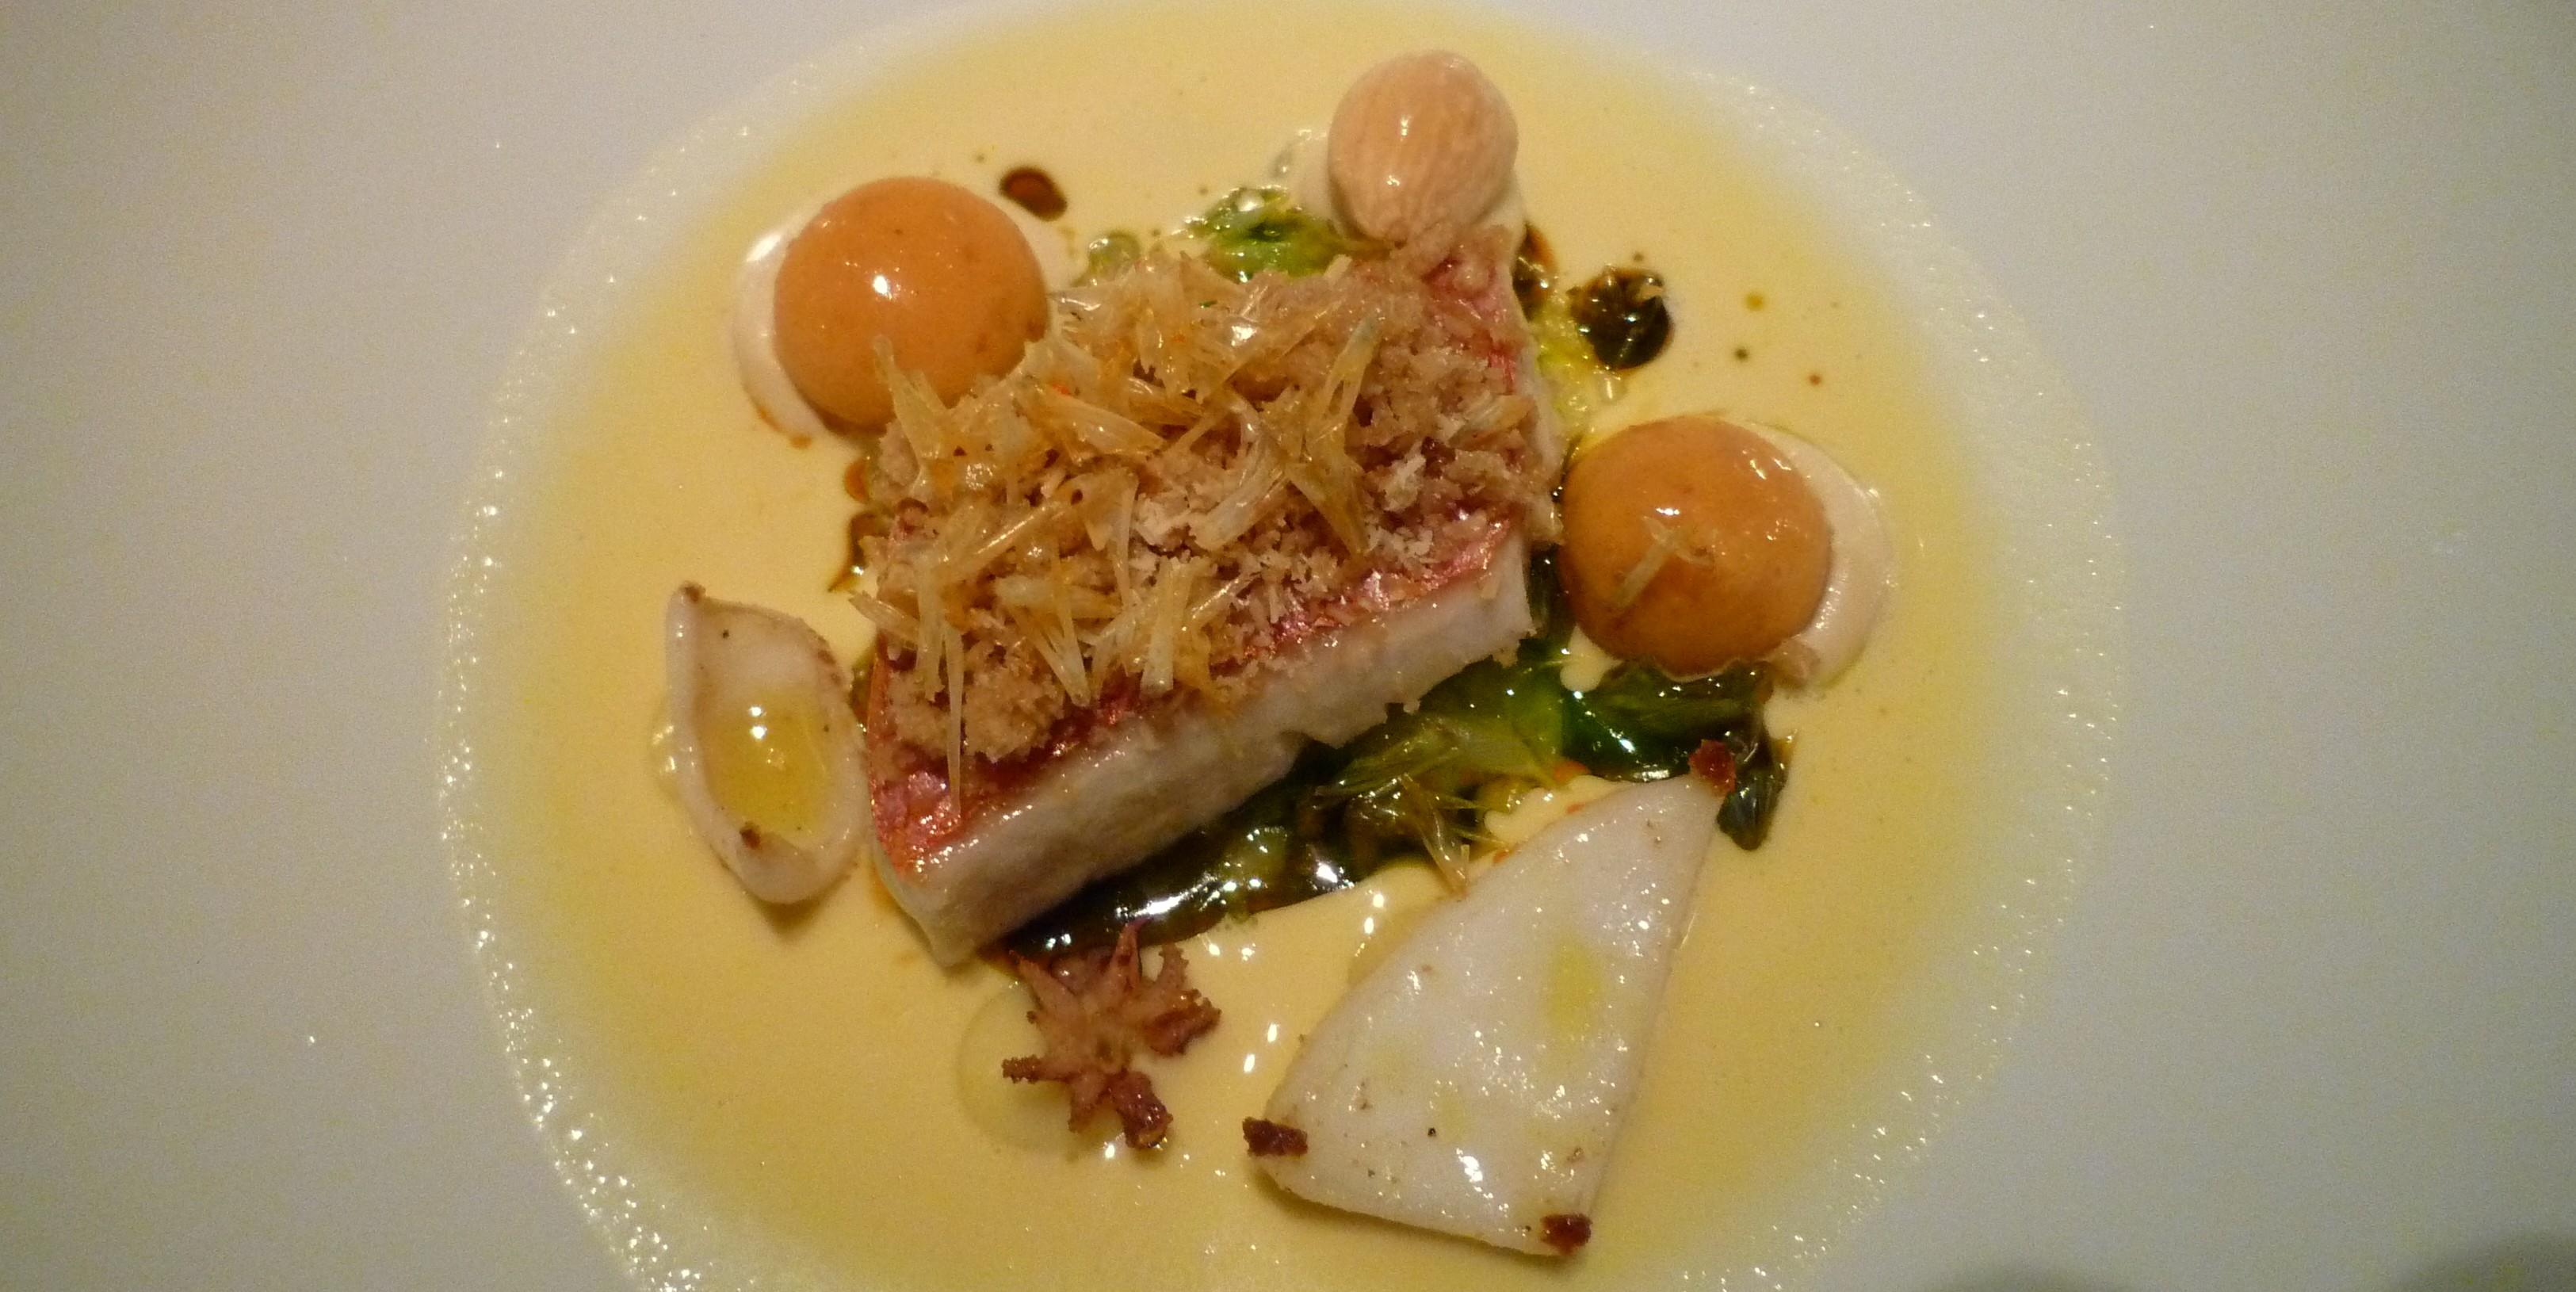 Rotbarbe & Calamaretti mit Zitrusaromen, Mandeln, Sobrassada-Gnocchi